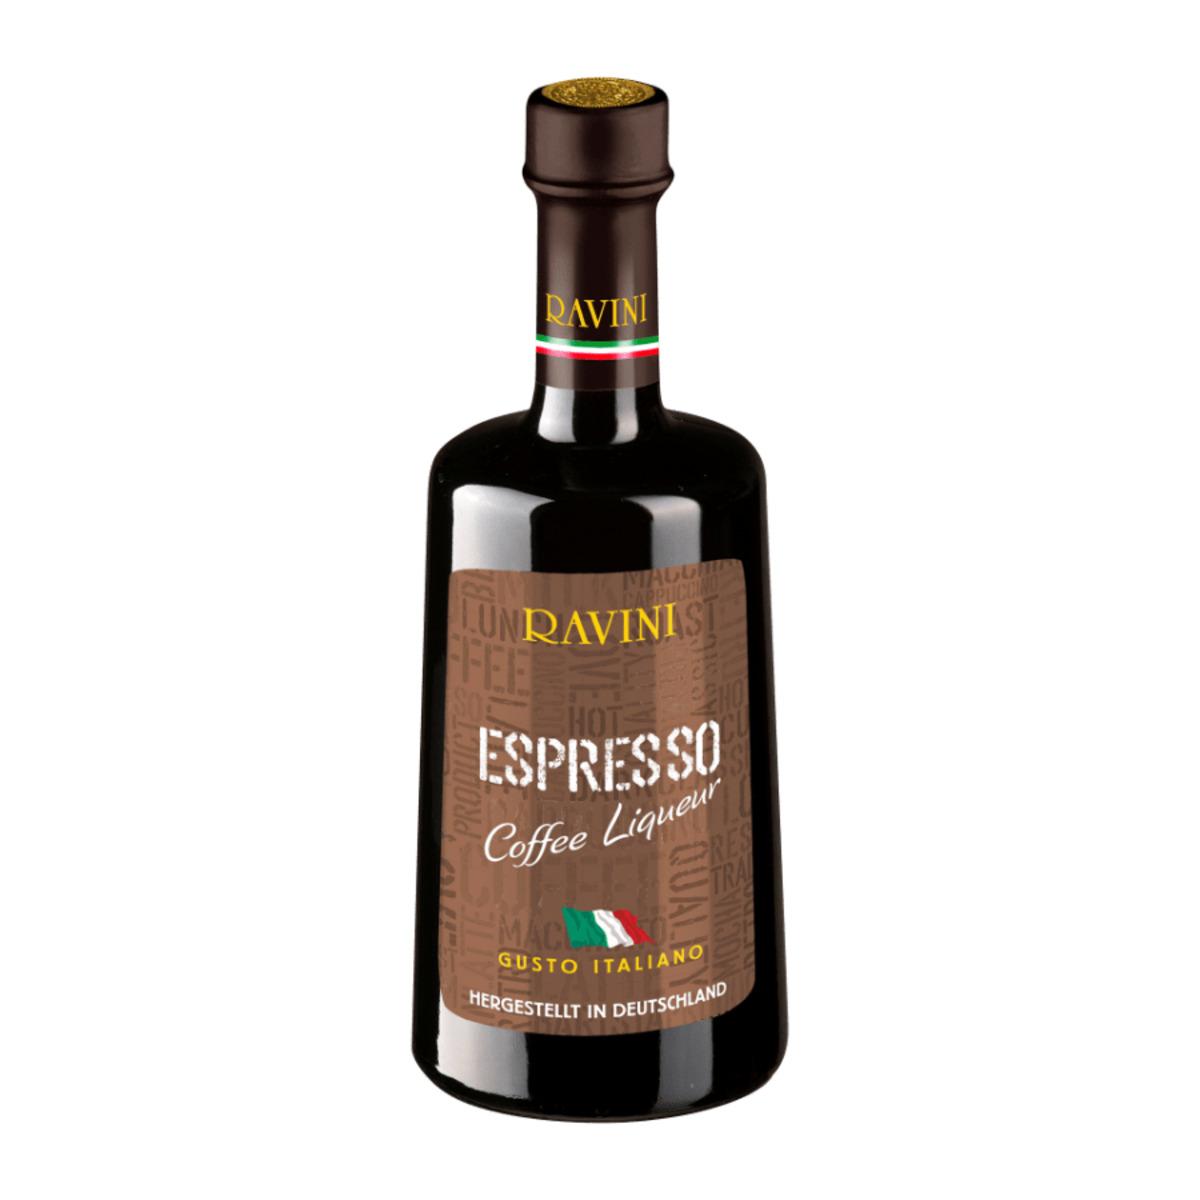 Bild 4 von RAVINI     Coffee Liqueur